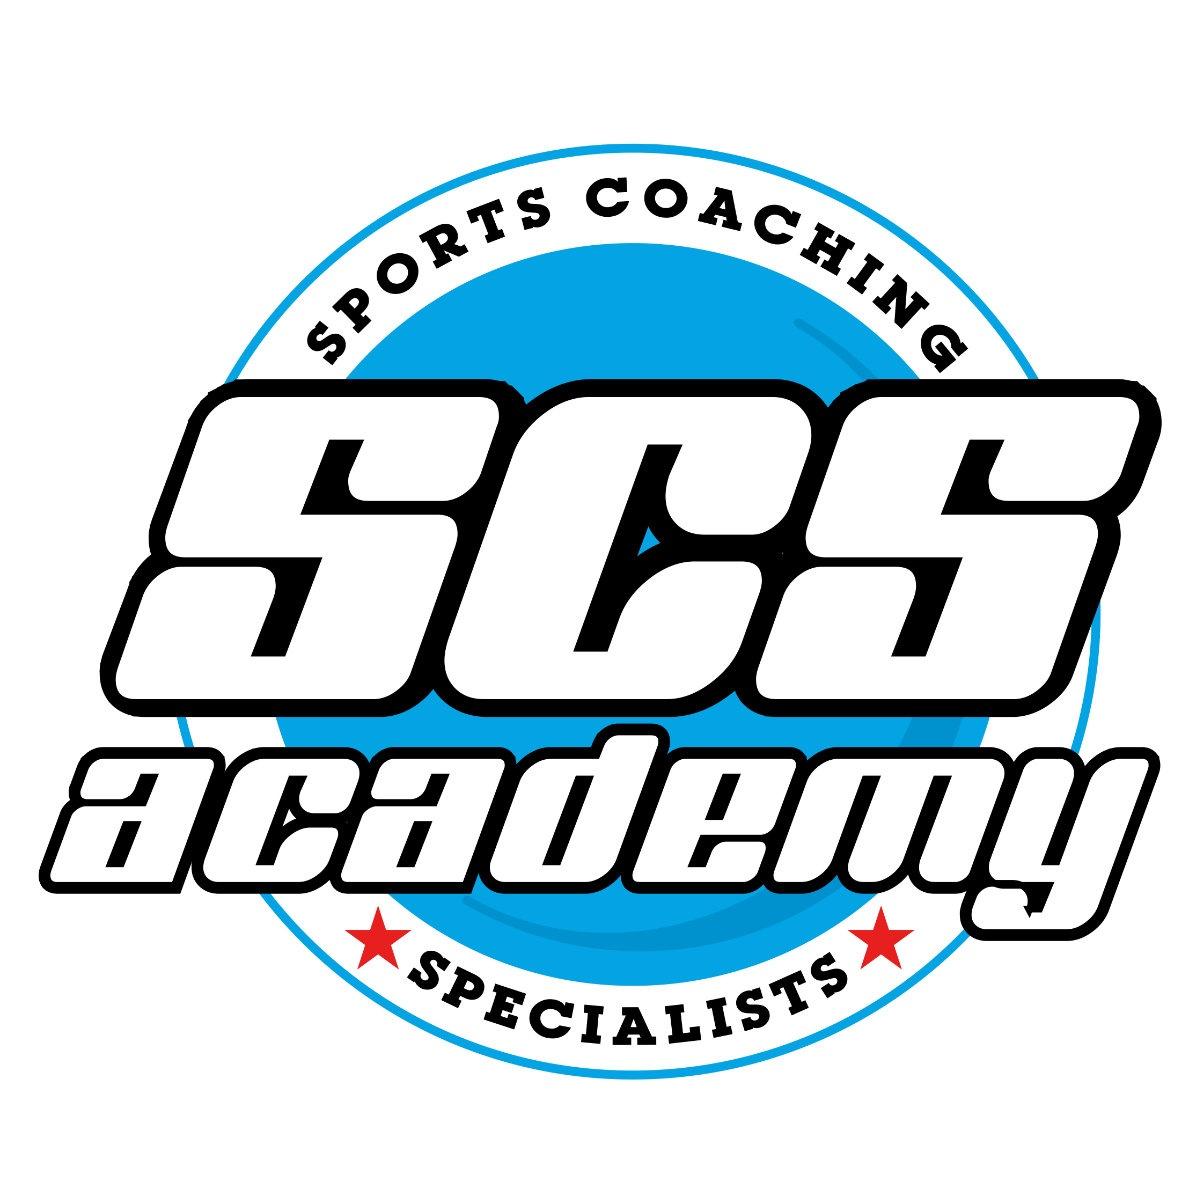 scs-academy-logo-2018